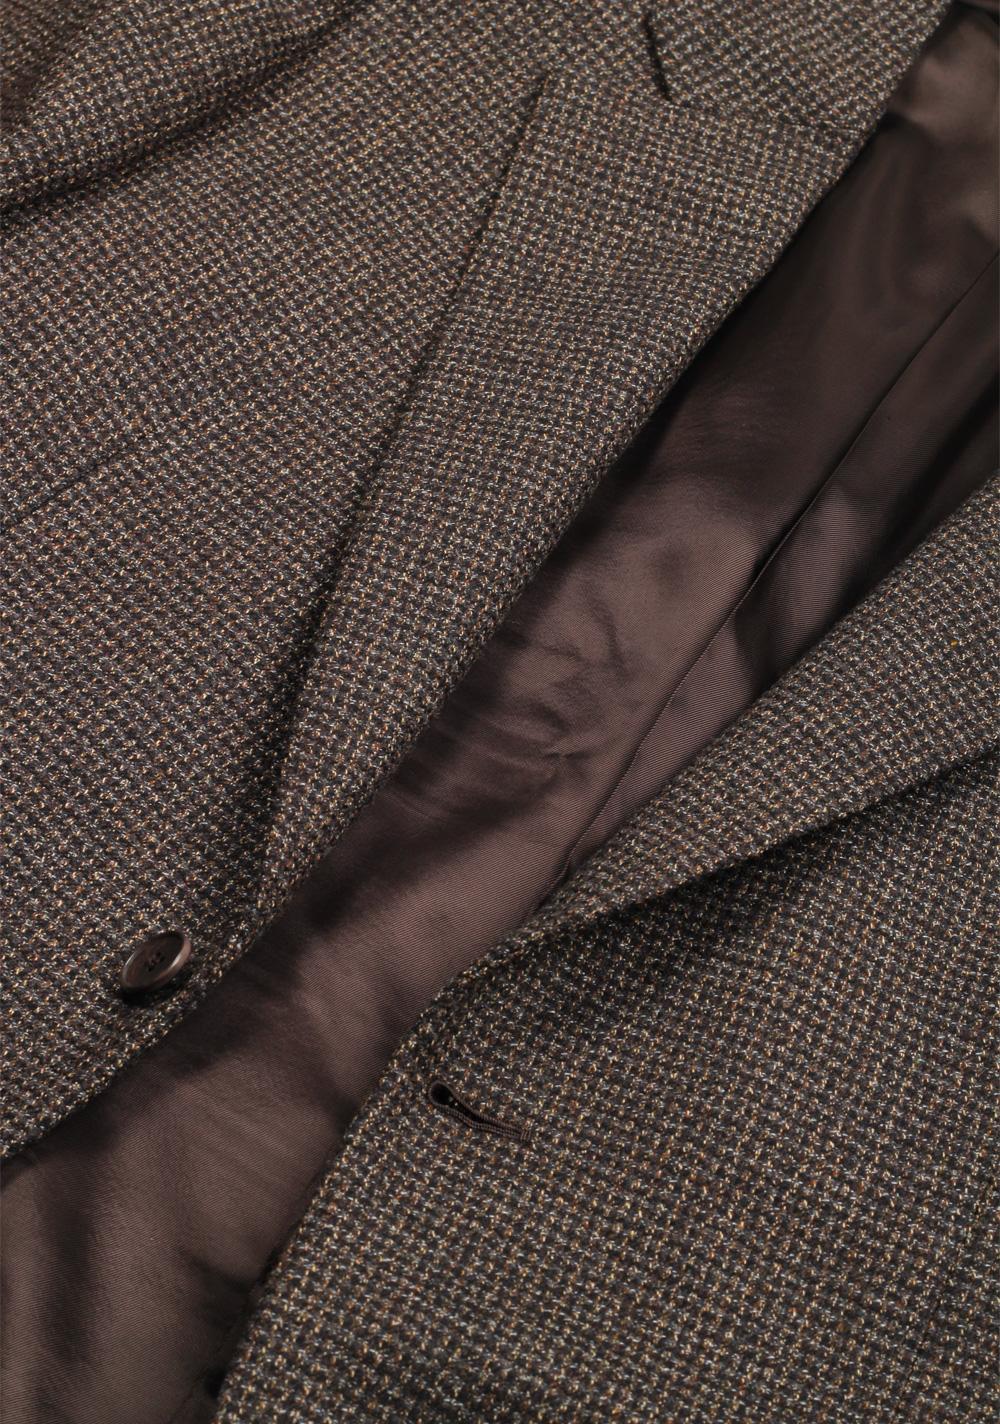 Ermenegildo Zegna Premium Couture Brown Sport Coat Size 50 / 40R U.S. | Costume Limité